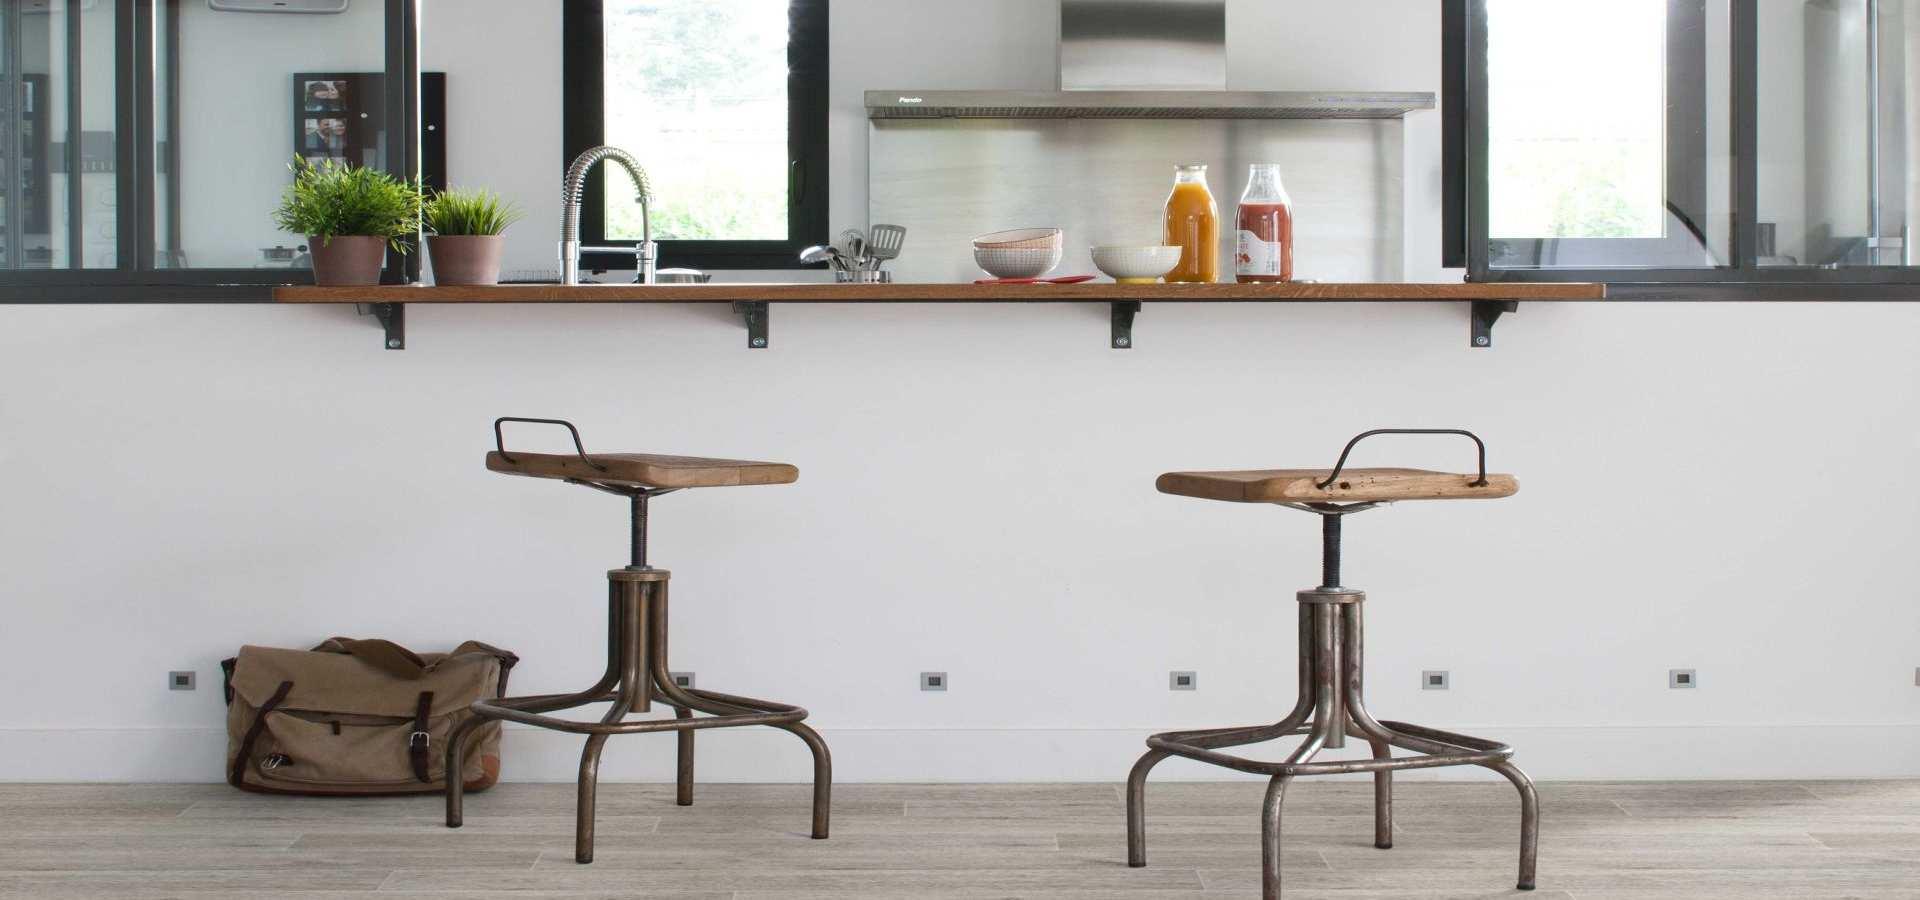 Bild Küche CV Belag rustikal